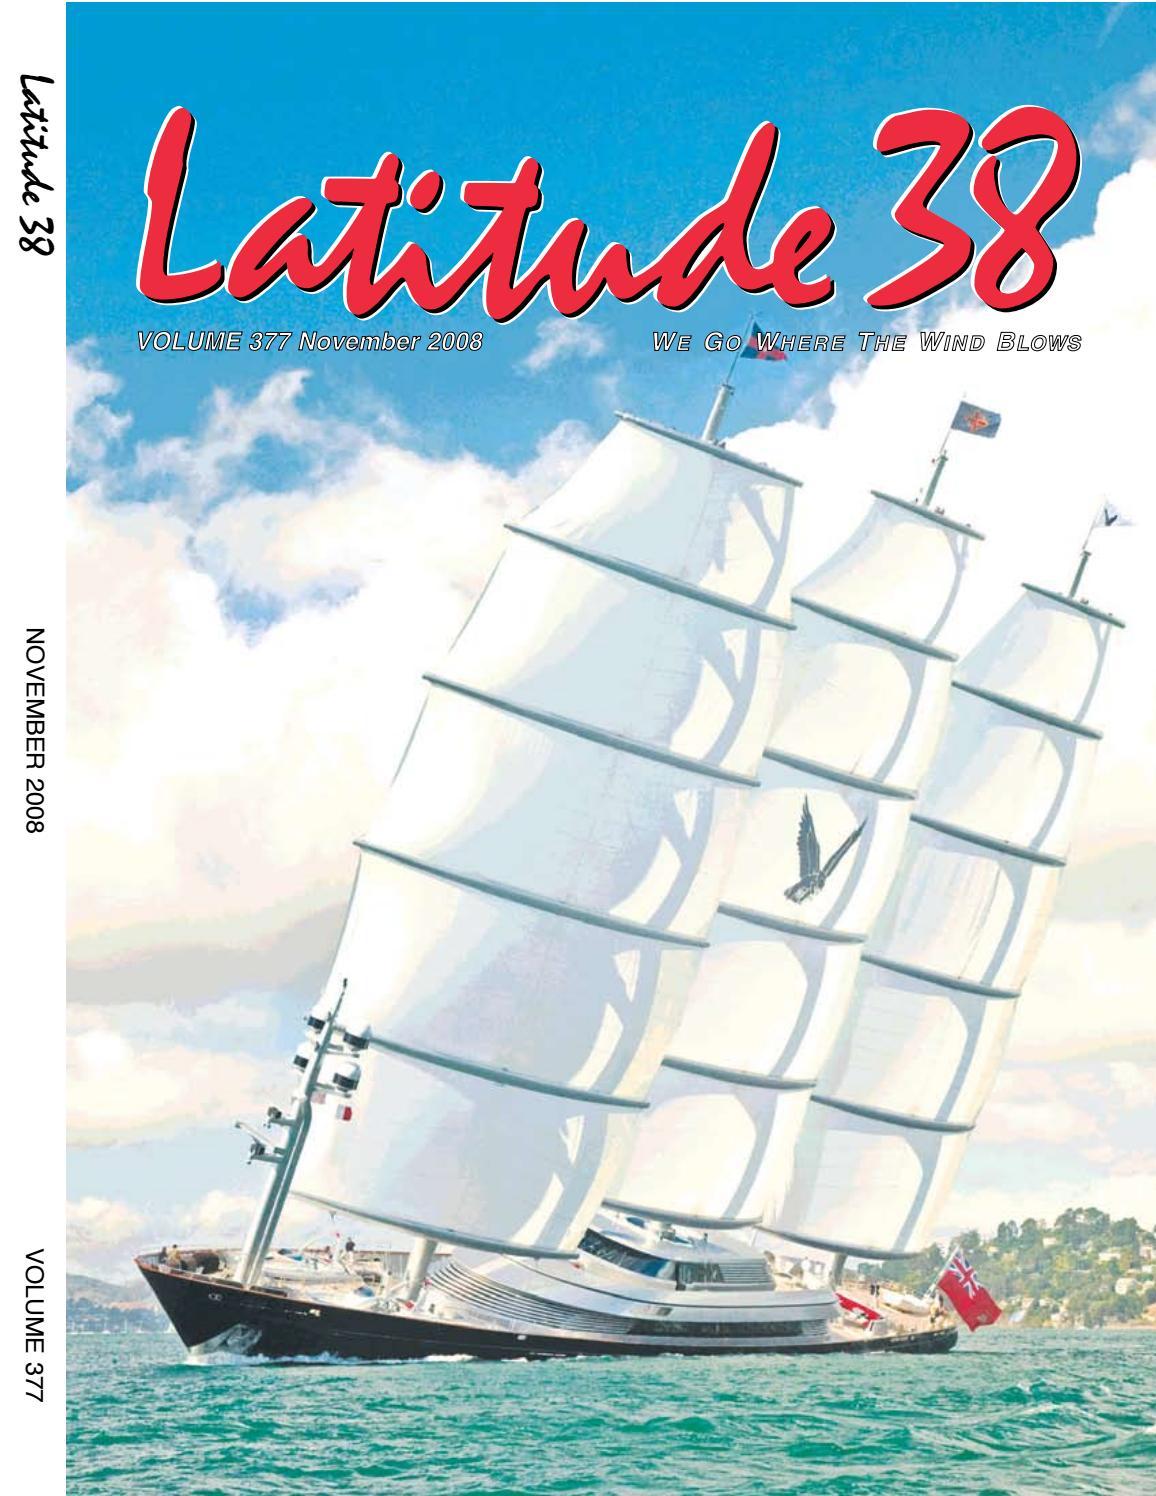 Latitude 38 November 2008 by Latitude 38 Media, LLC - issuu